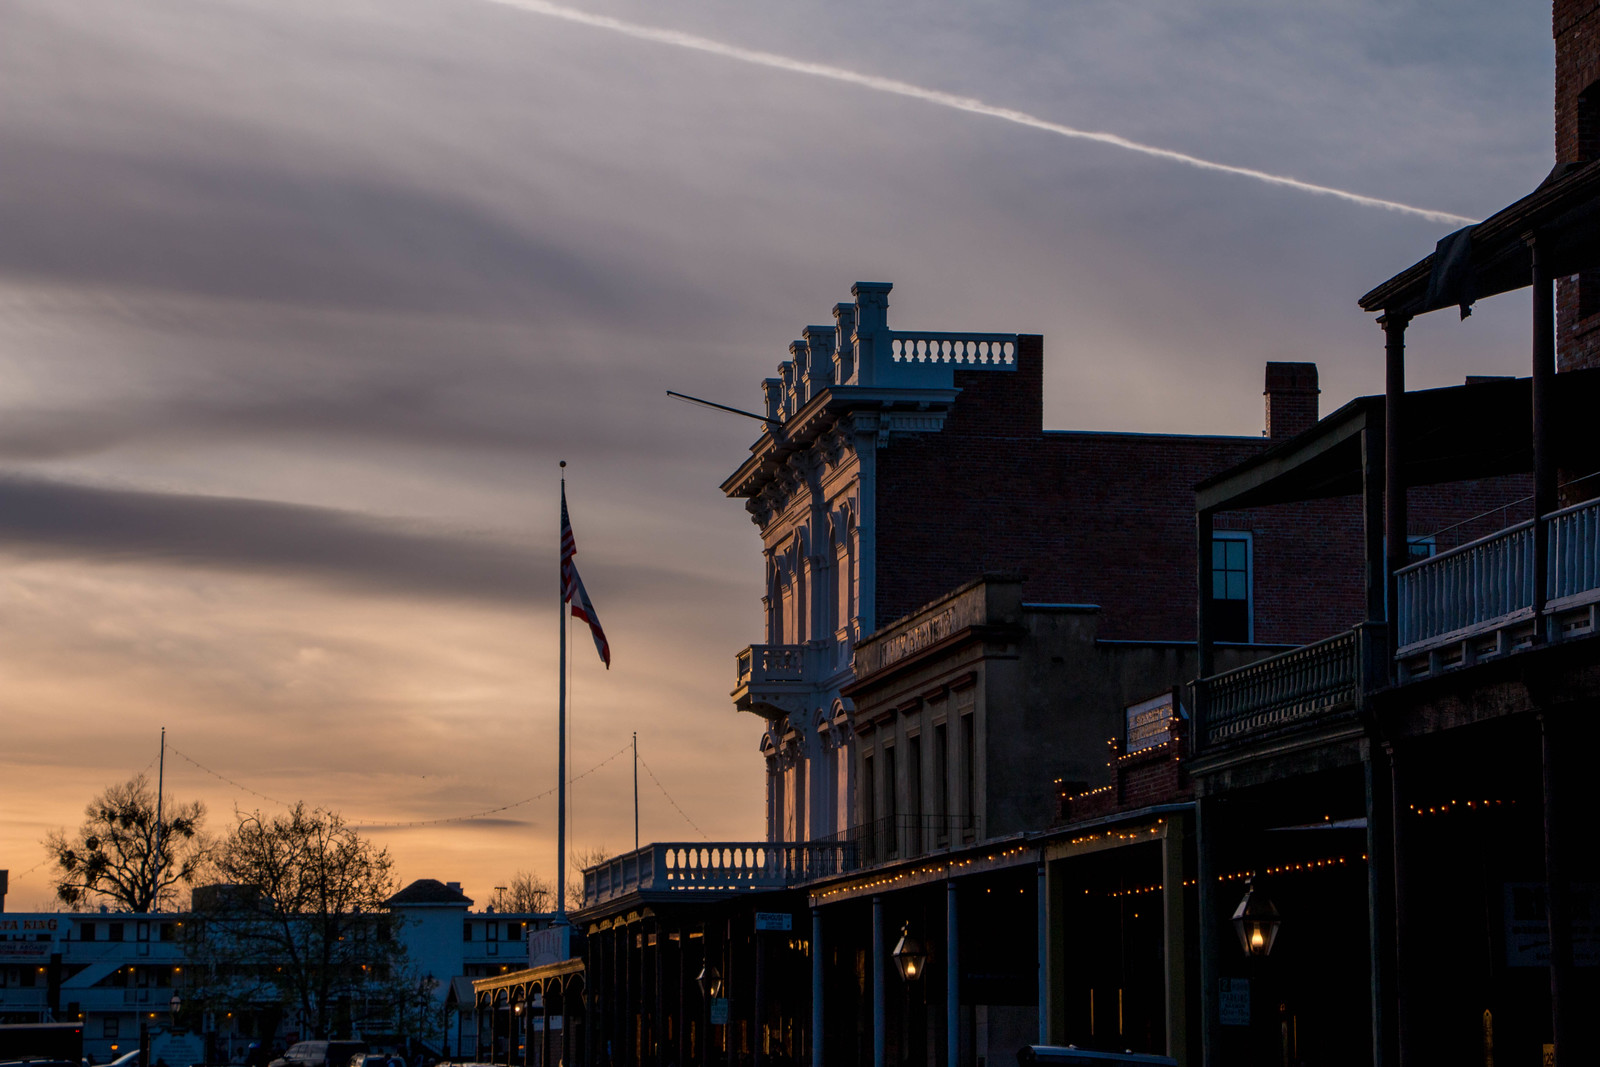 03.25. Sacramento Old Town